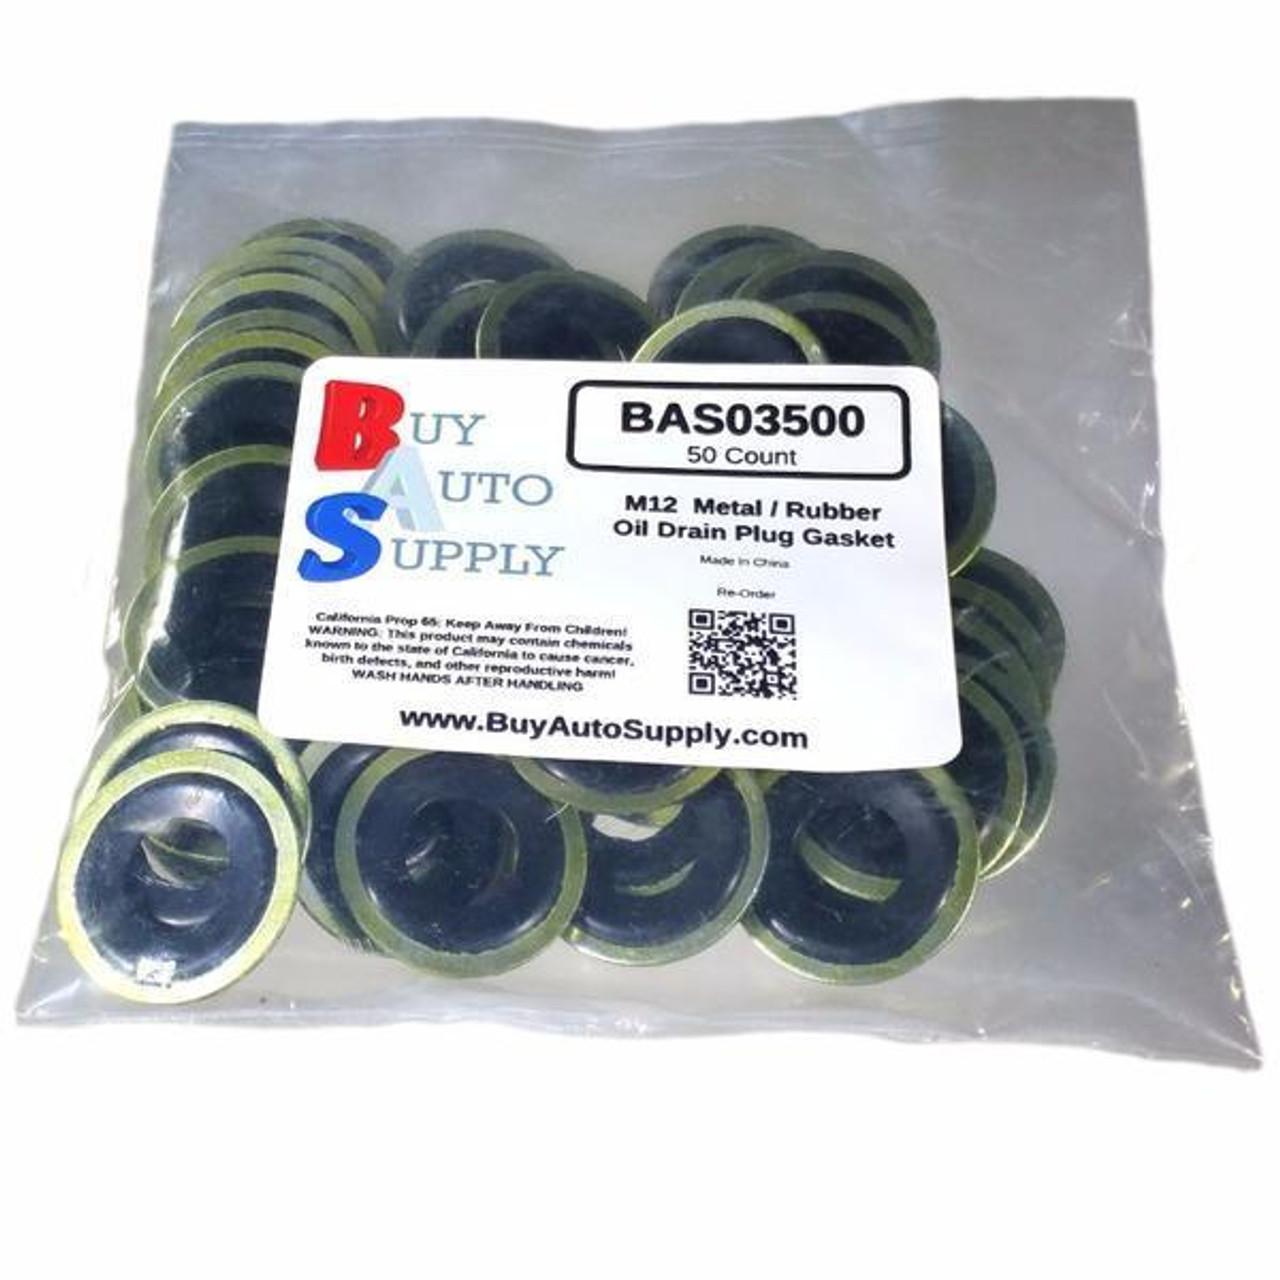 Bag of 50 M12 Metal Rubber Oil Drain Plug Gaskets